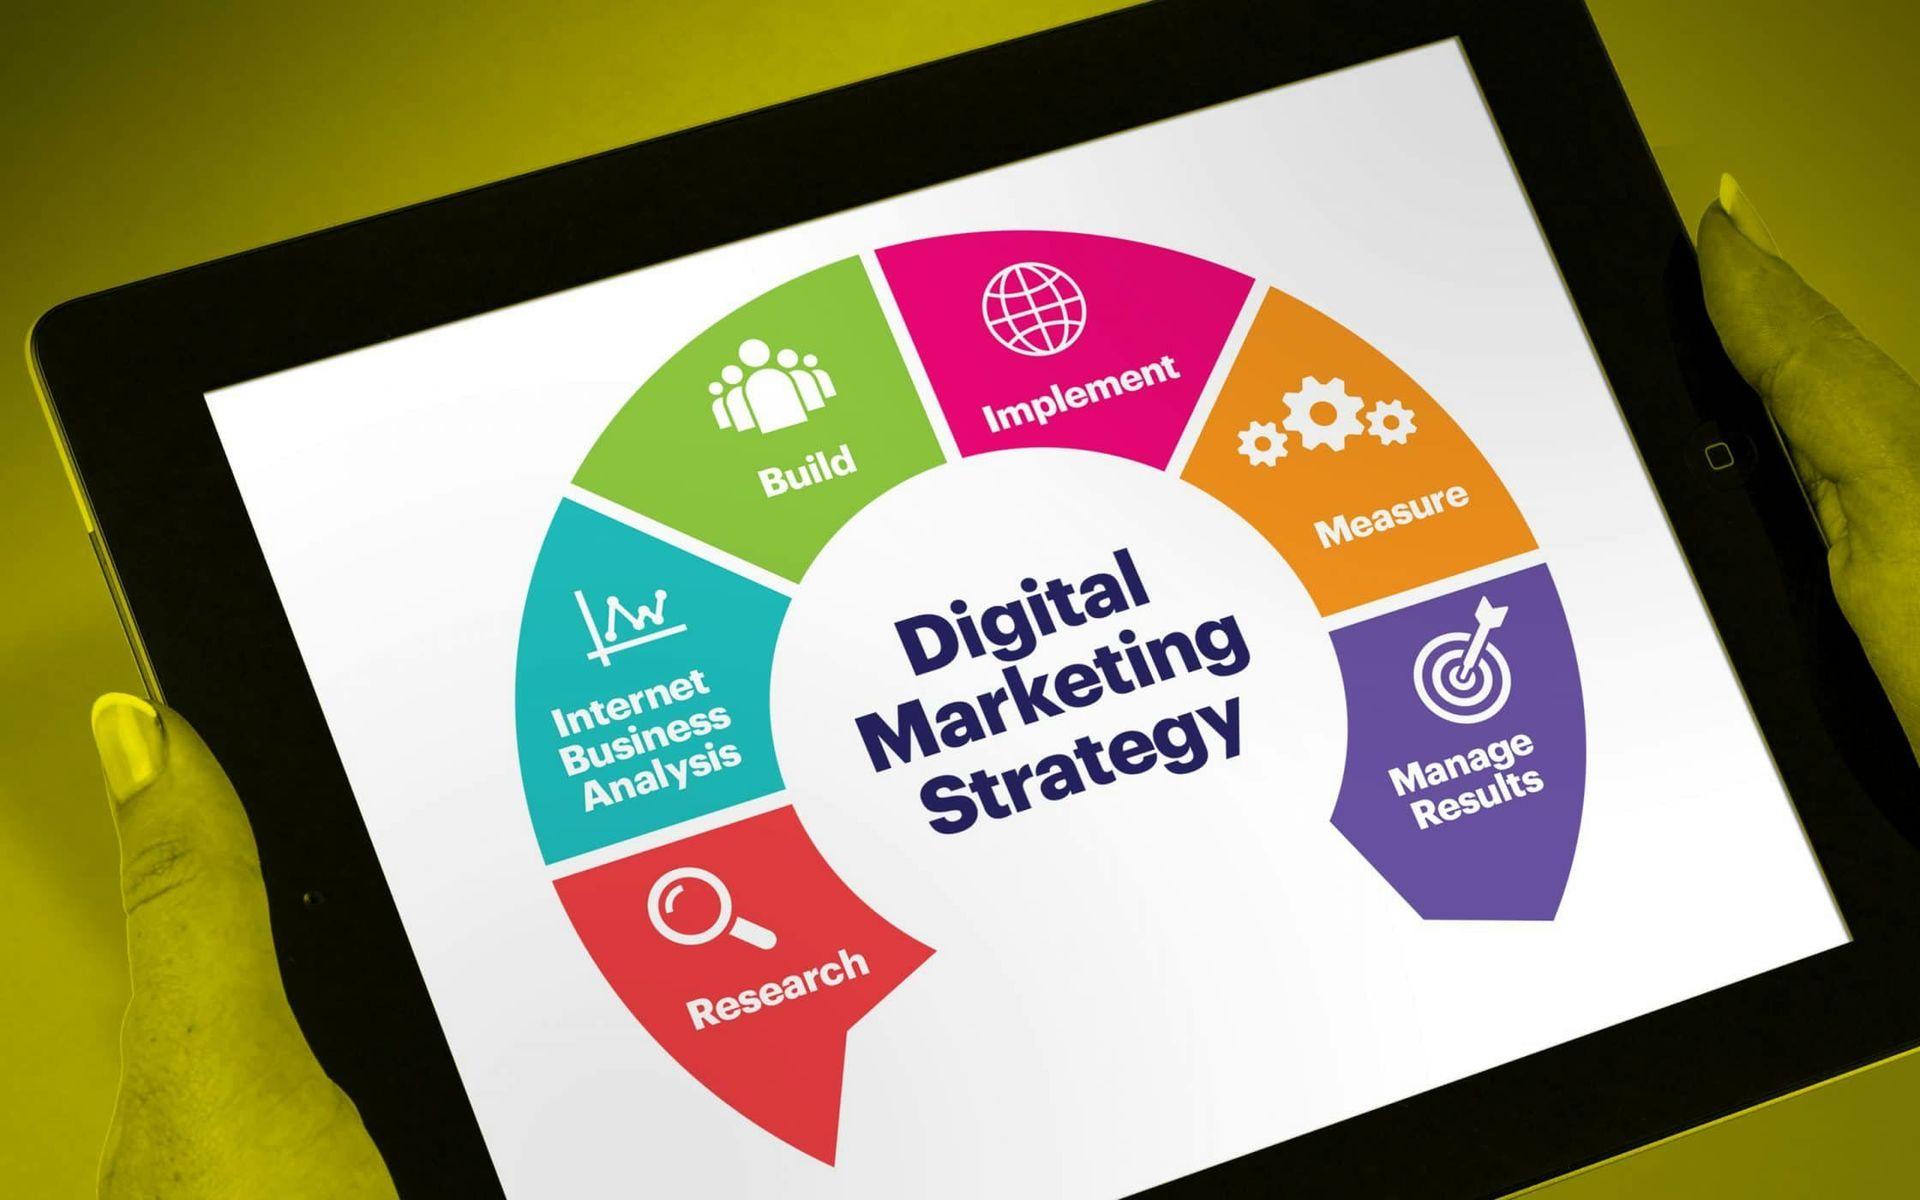 digital-marketing-campaign-5-digital-marketing